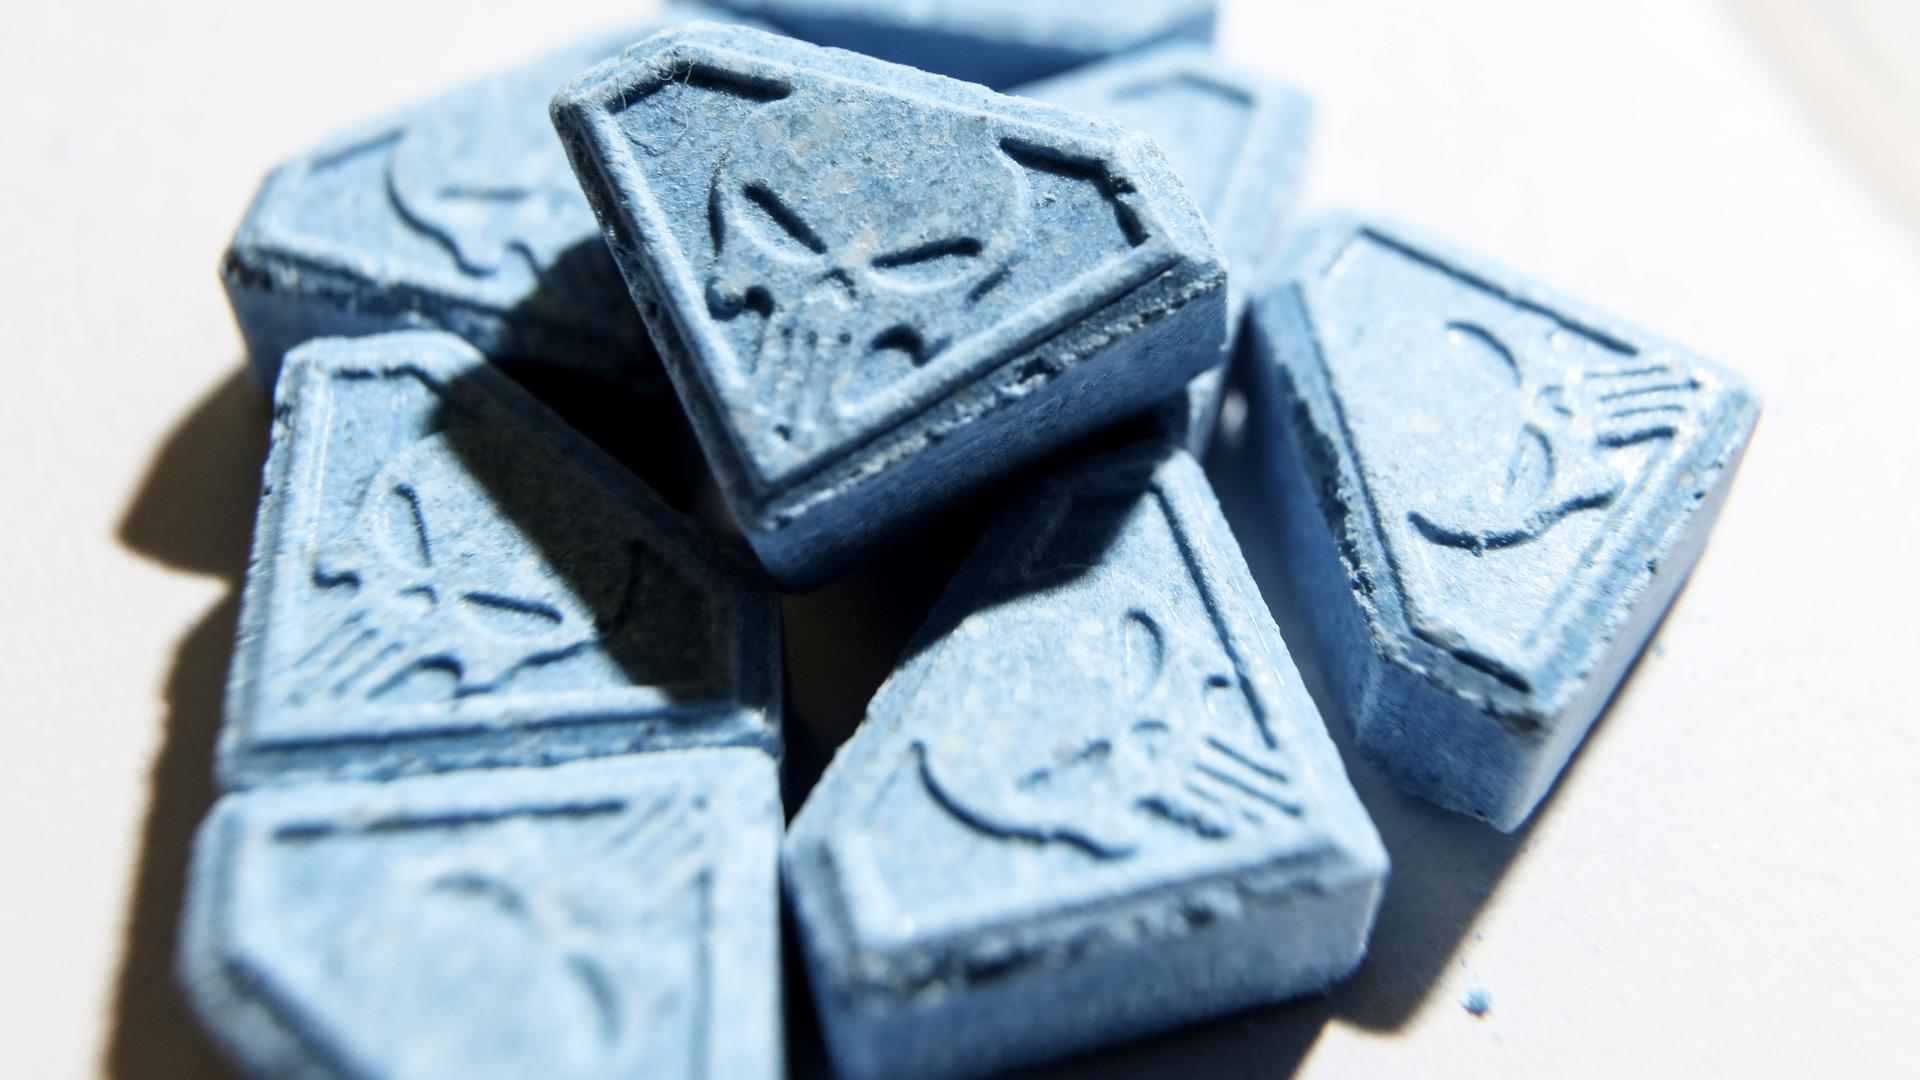 Tabletten mit Totenkopf-Symbolen